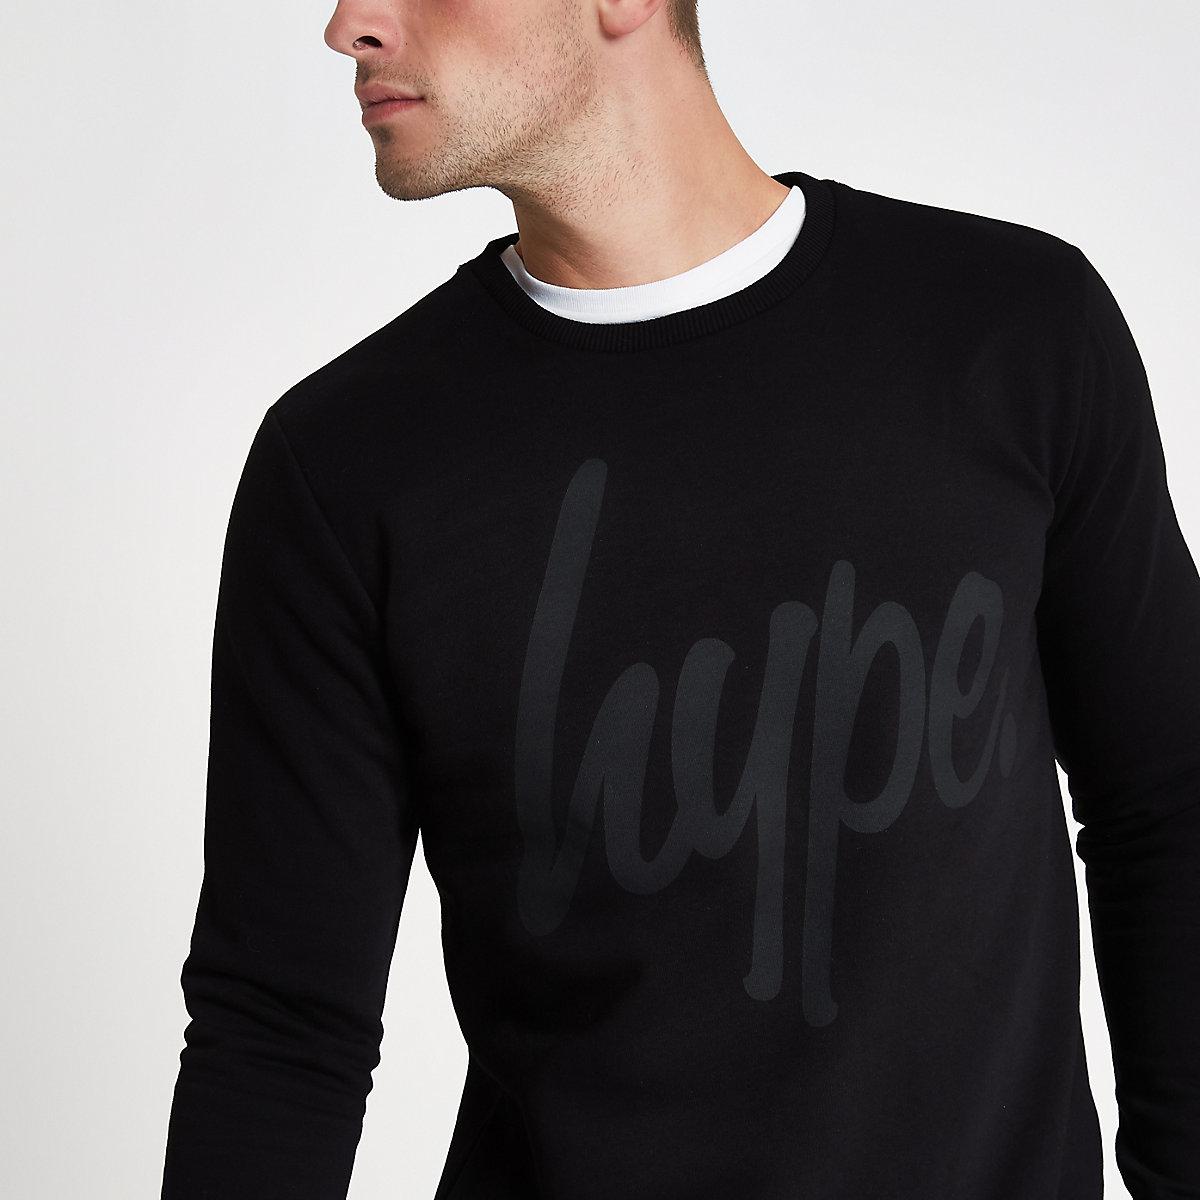 Hype black crew neck sweatshirt